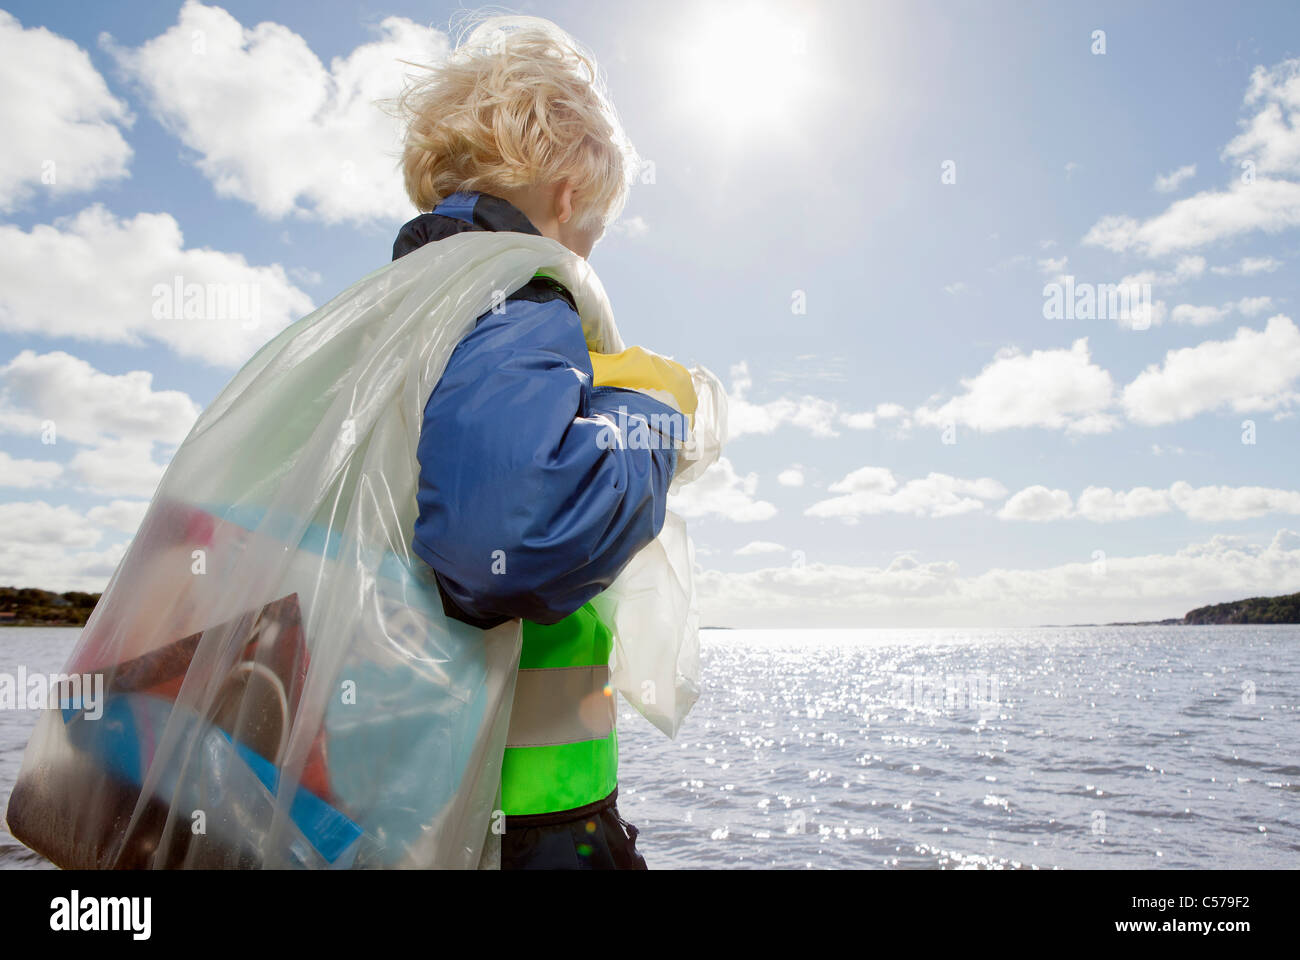 Boy hauling bag of trash on beach - Stock Image